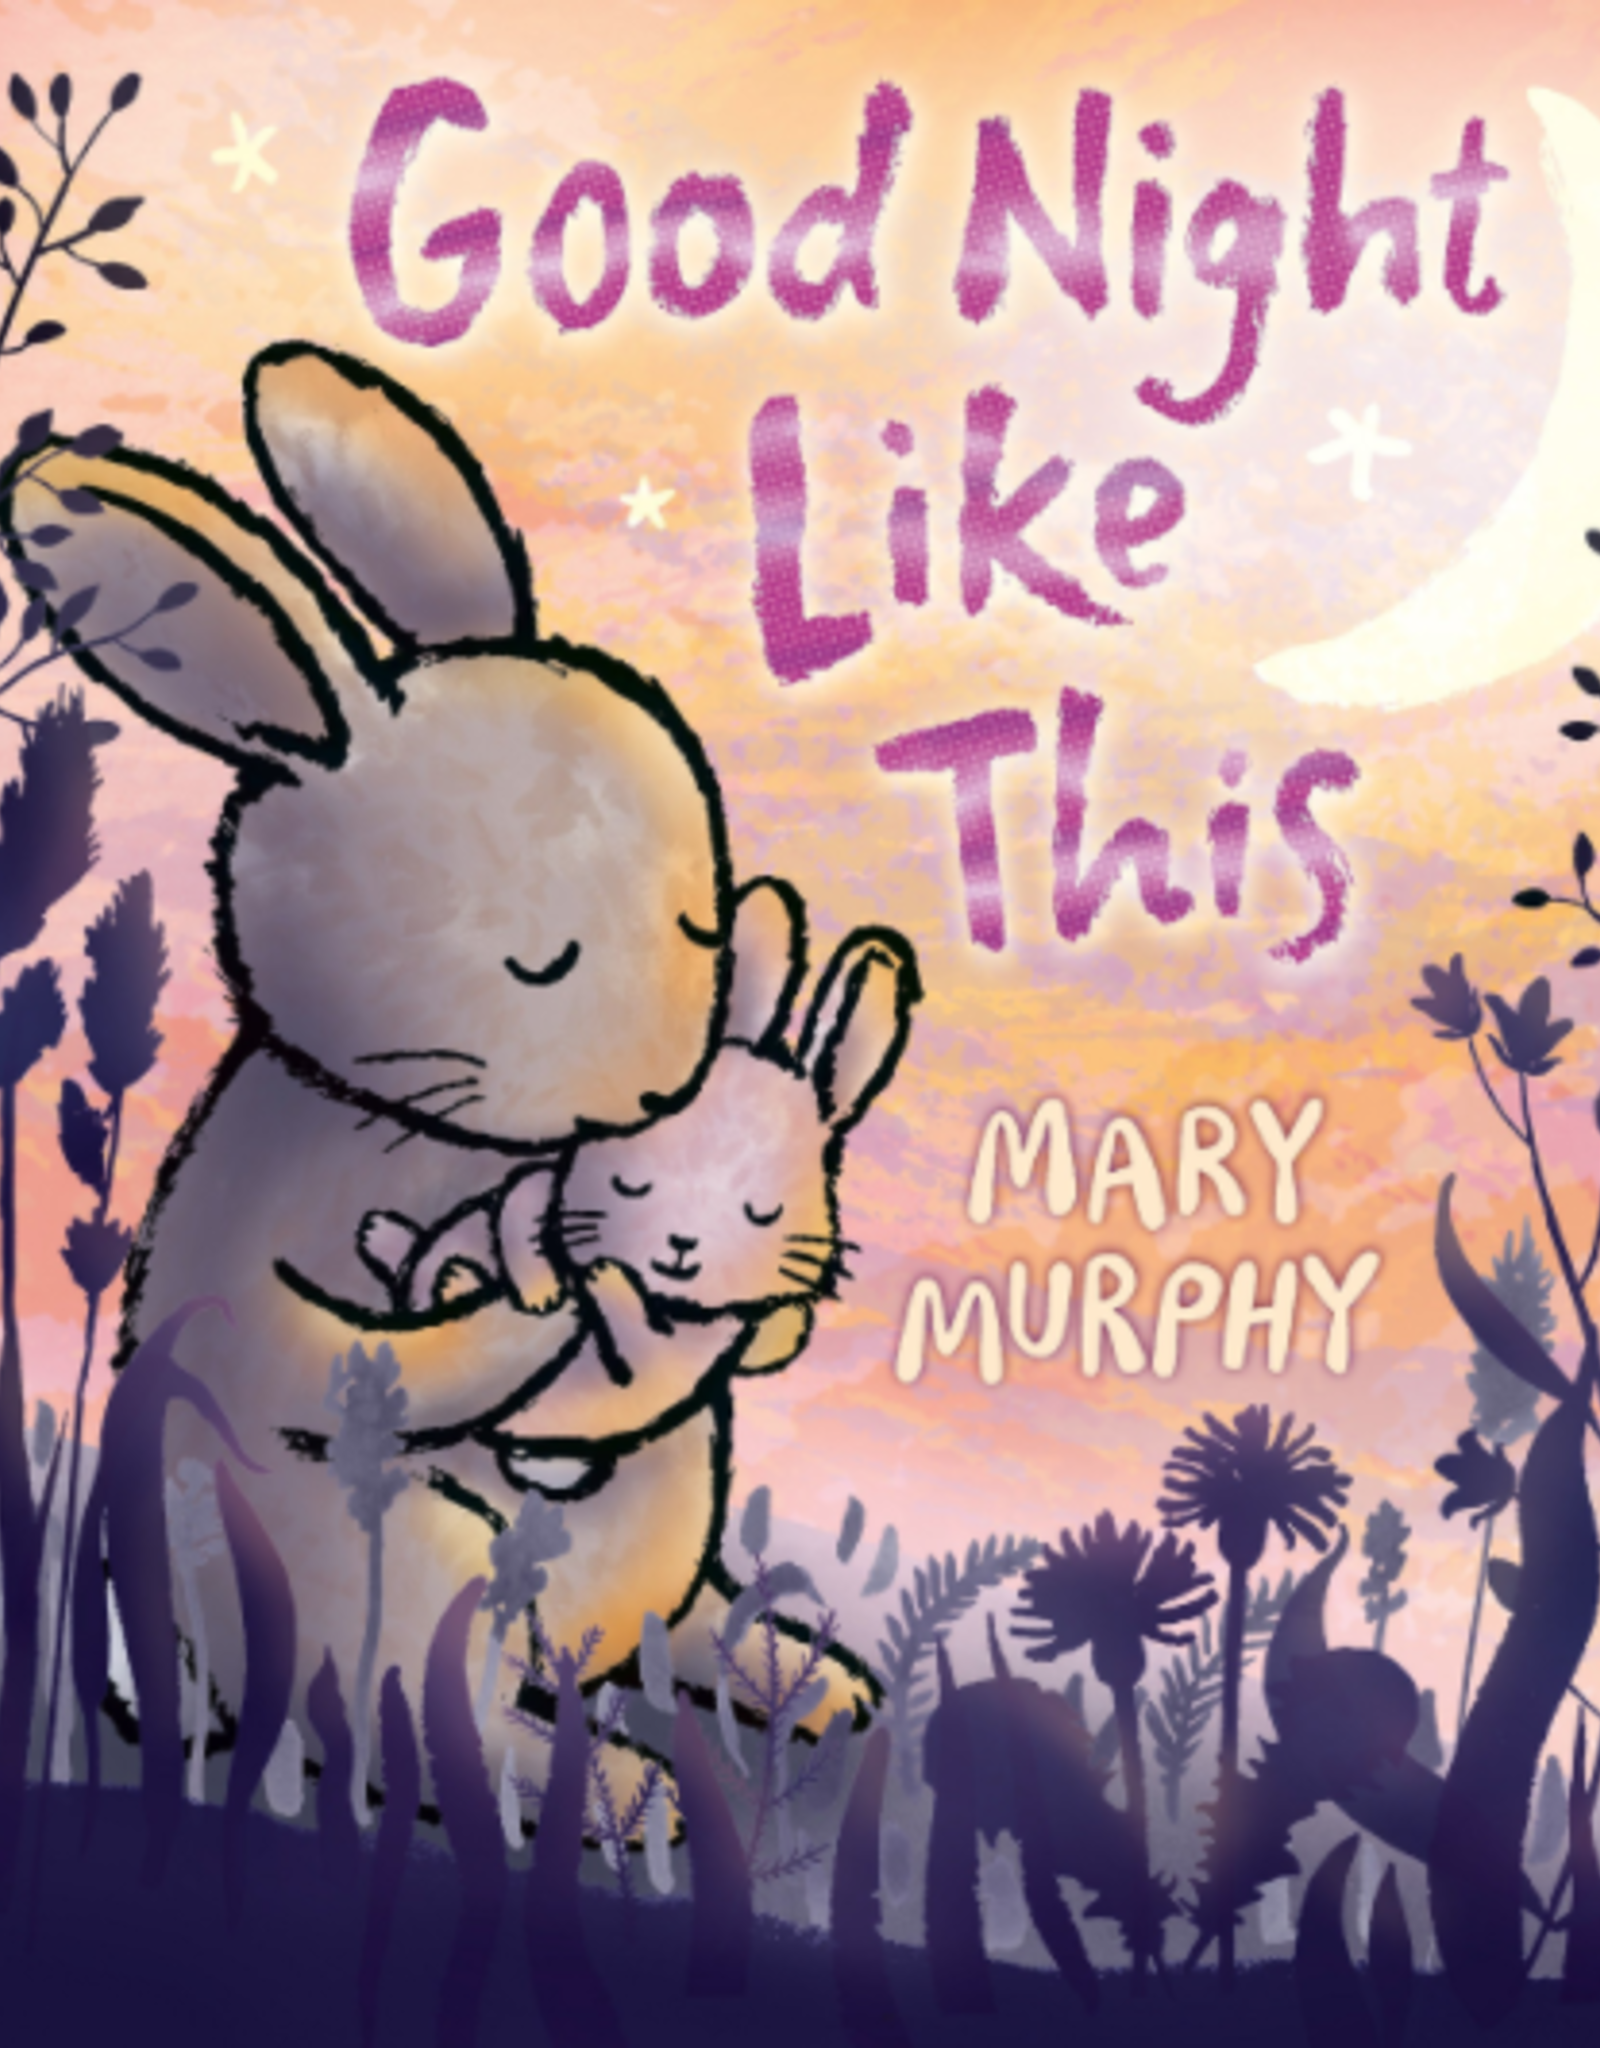 Argosy Good Night Like This - Mary Murphy